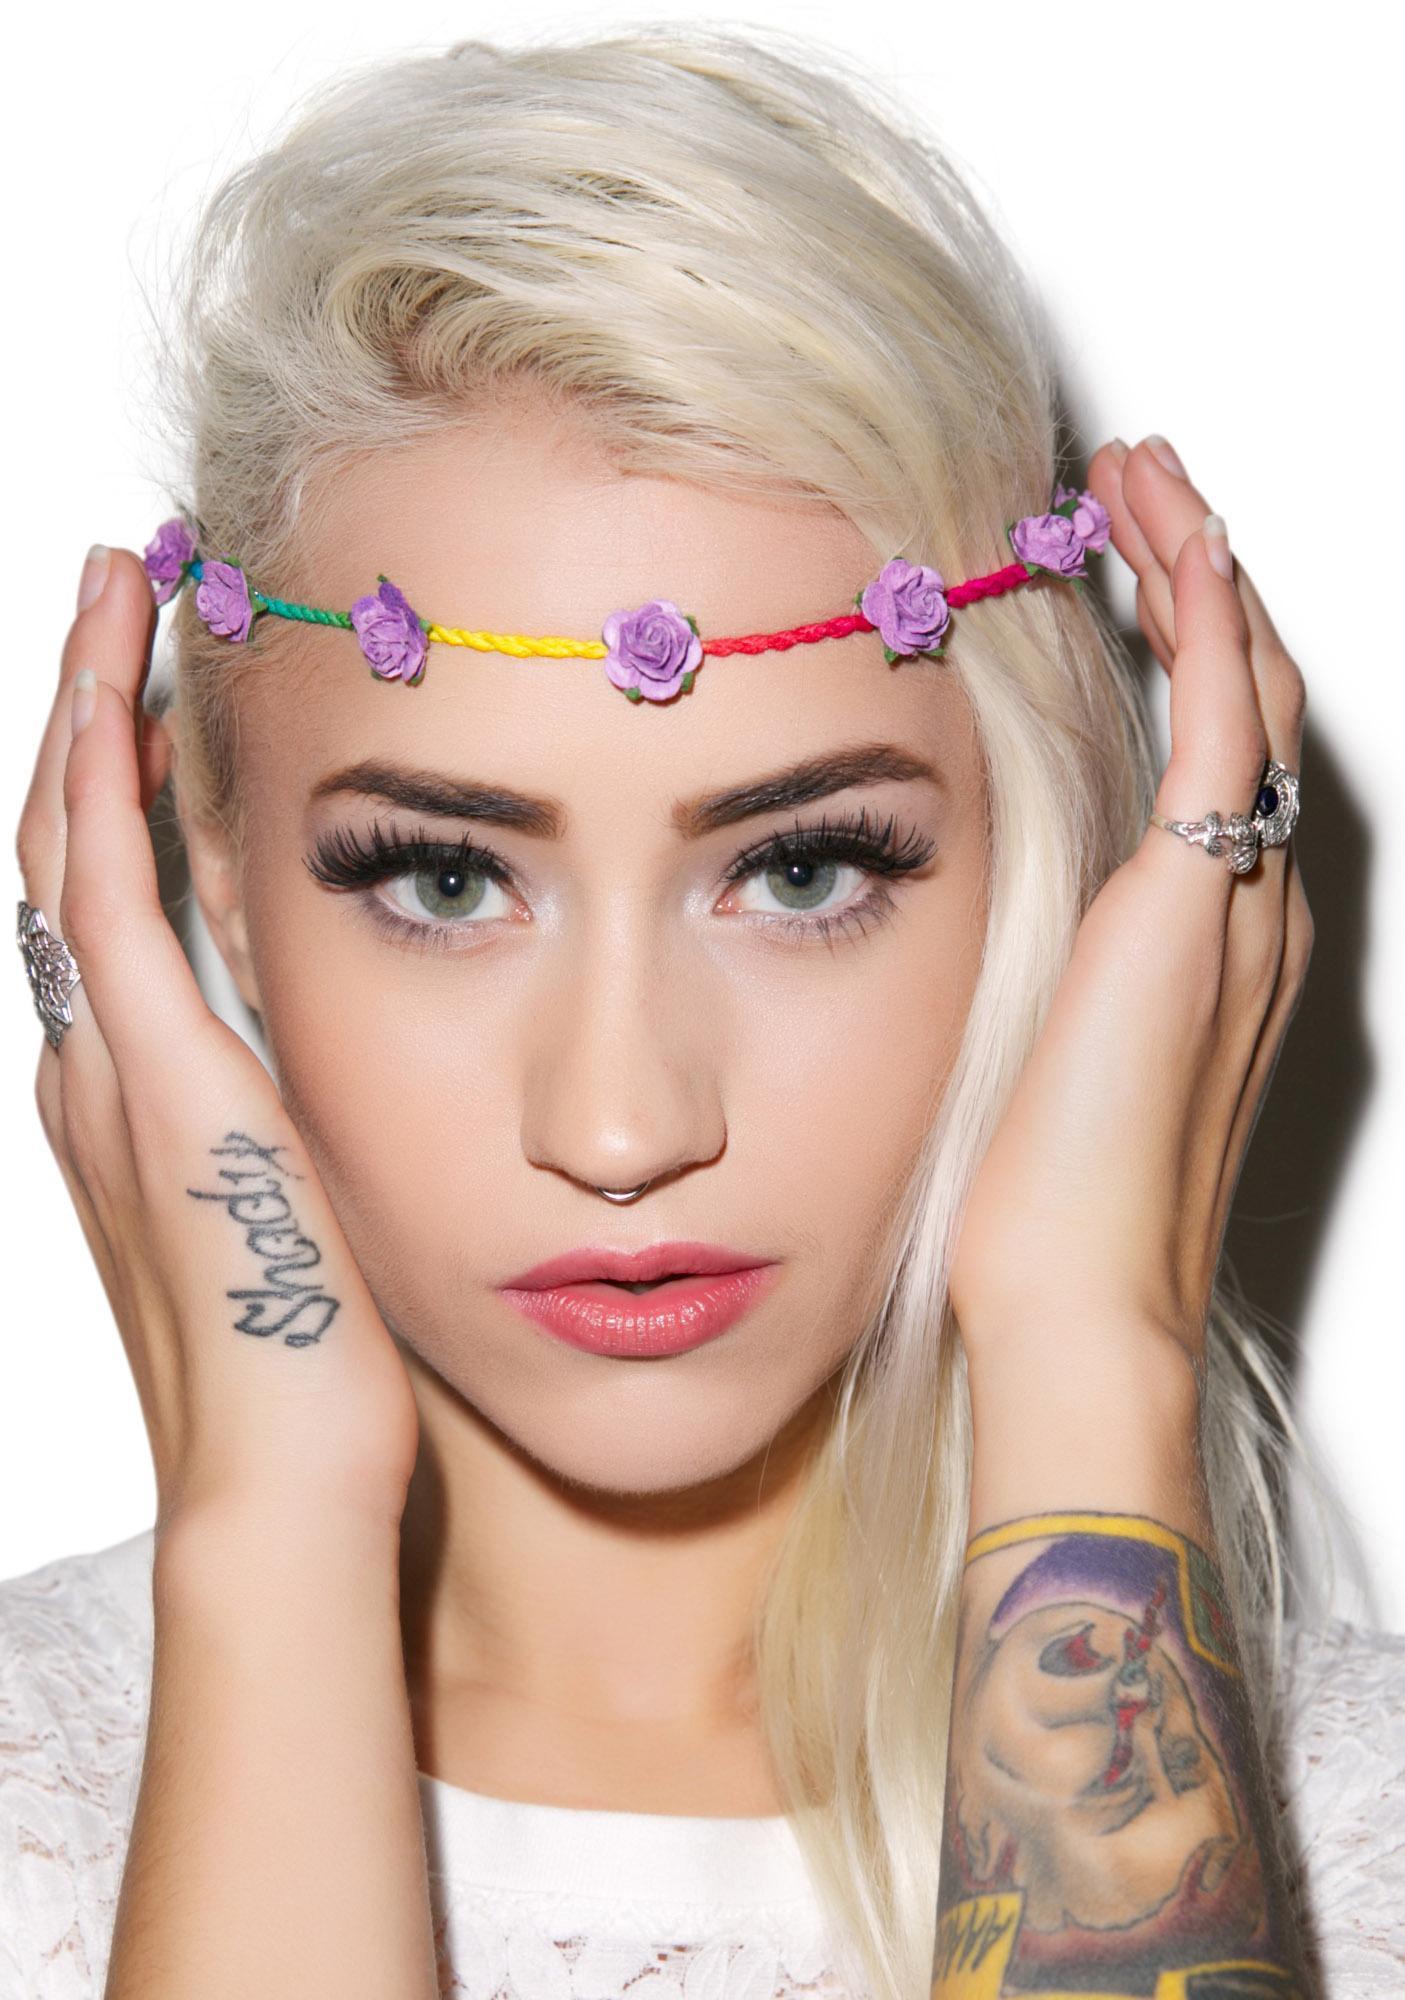 Bella Floral Headband